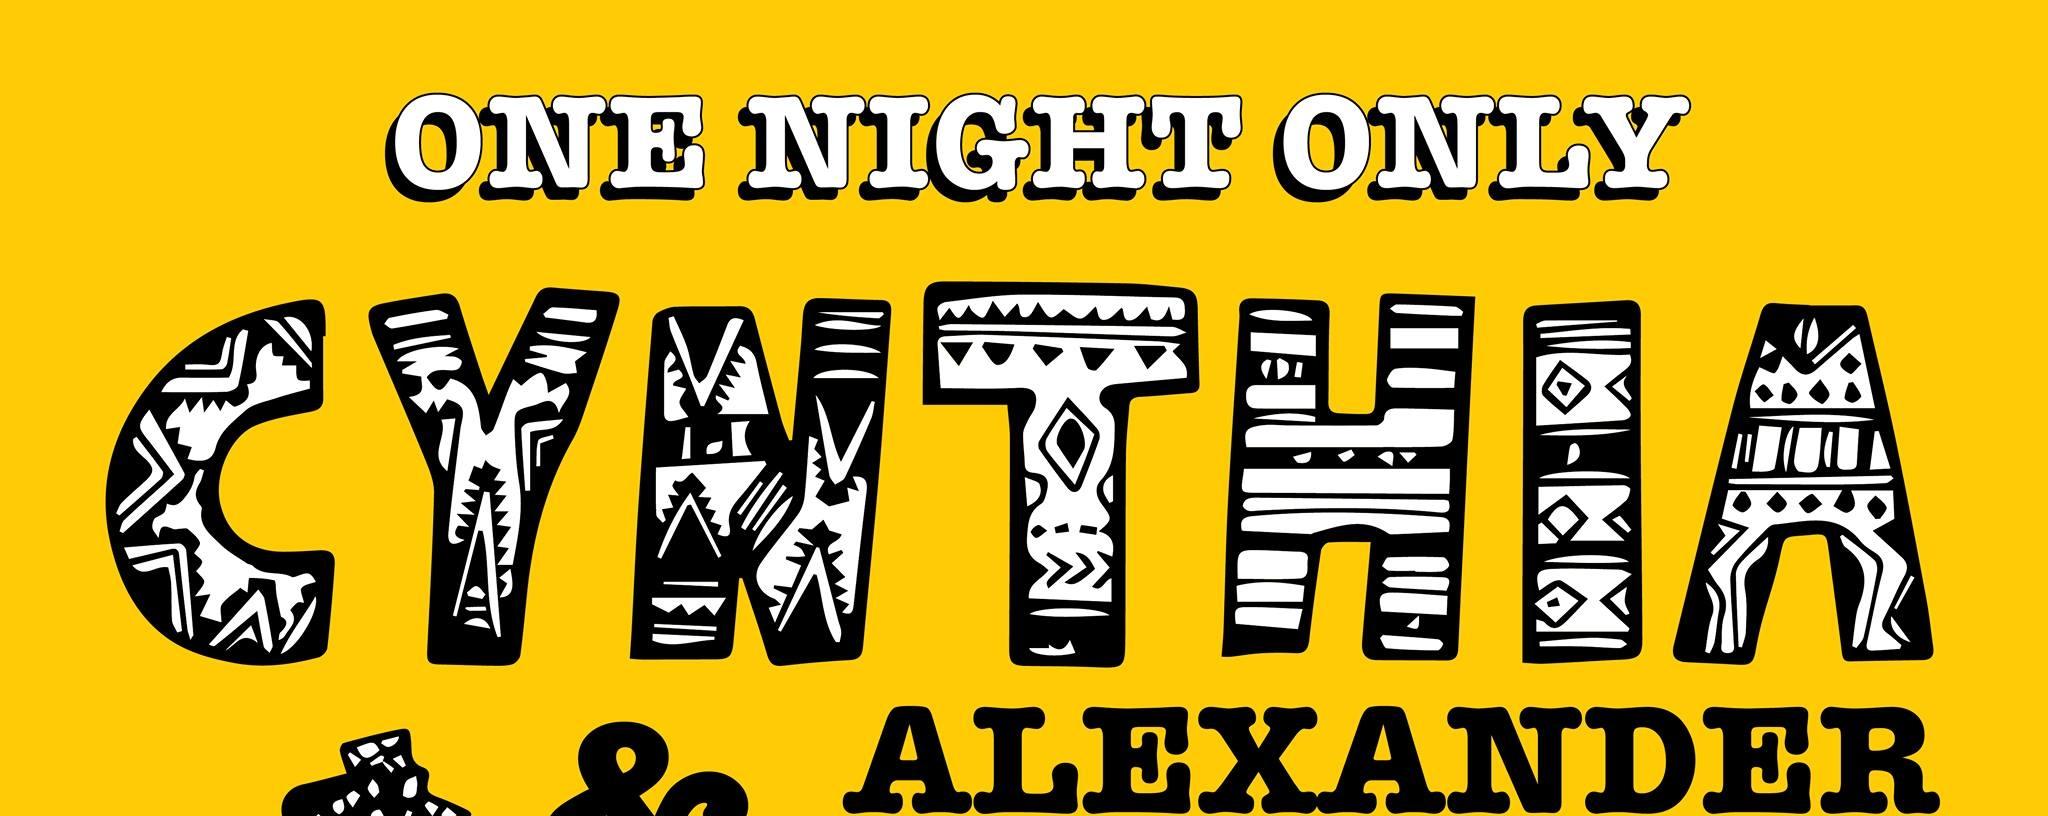 One Night Only: Cynthia Alexander & Joey Ayala